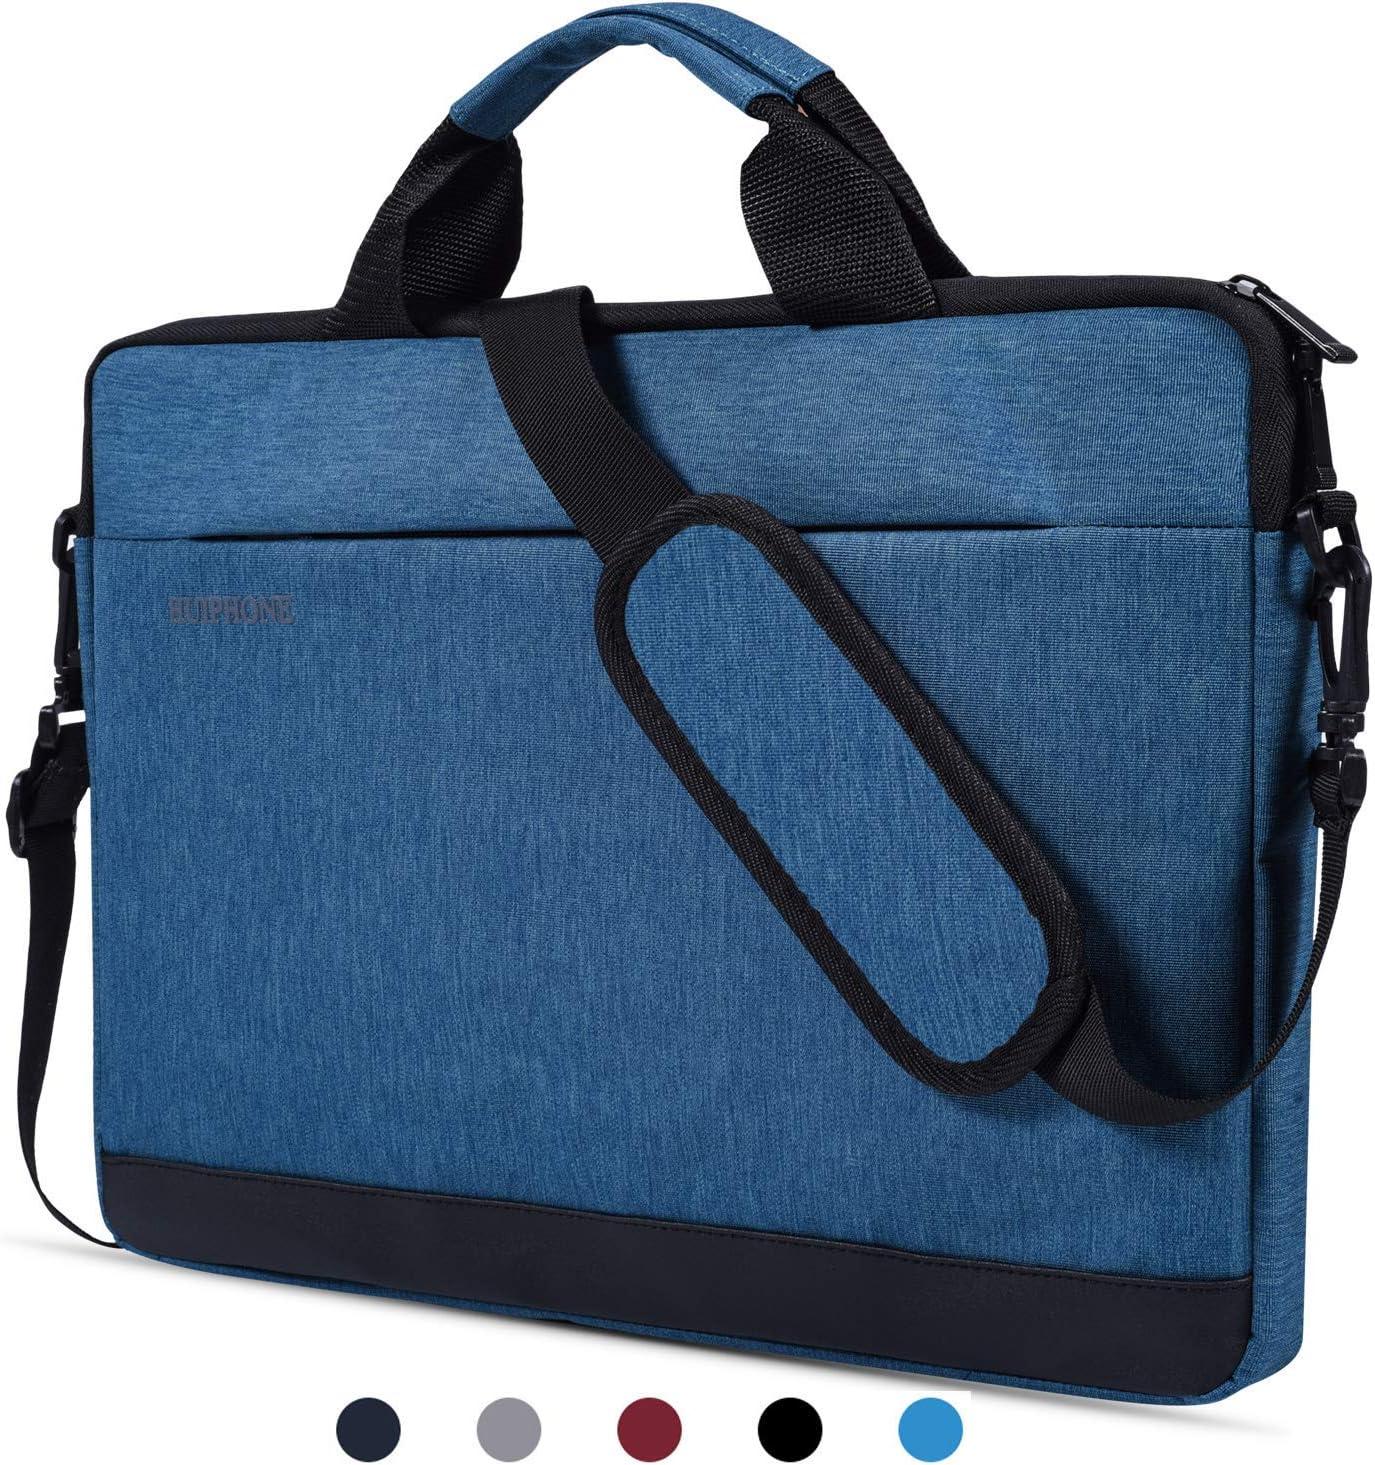 "15.6 Inch Laptop Shoulder Bag Waterproof Laptop Case Sleeve Compatible Acer Aspire E 15/Predator/Chromebook 15,Lenovo Yoga 730 15.6"",Dell Inspiron,ASUS VivoBook,LG Gram 15.6"",MSI HP Notebook Bag,Blue"